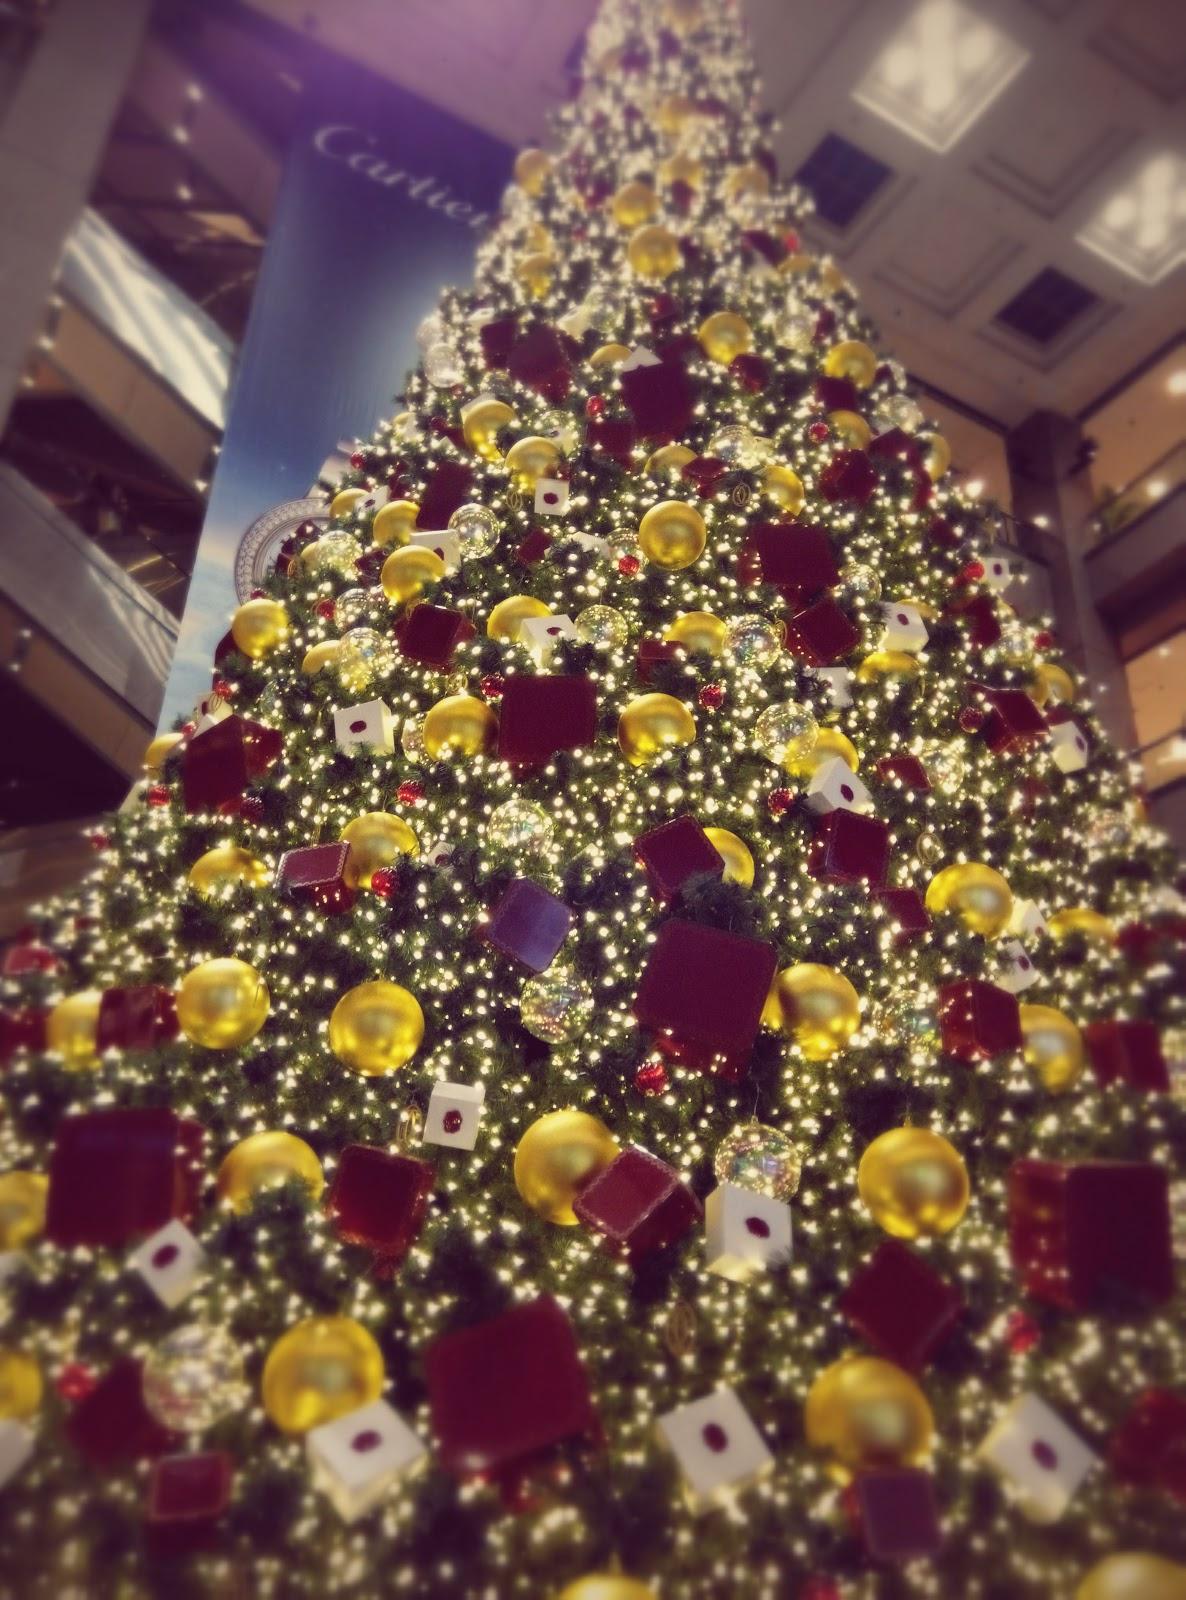 Christmas Tree, Takashimaya, Orchard Road, Singapore